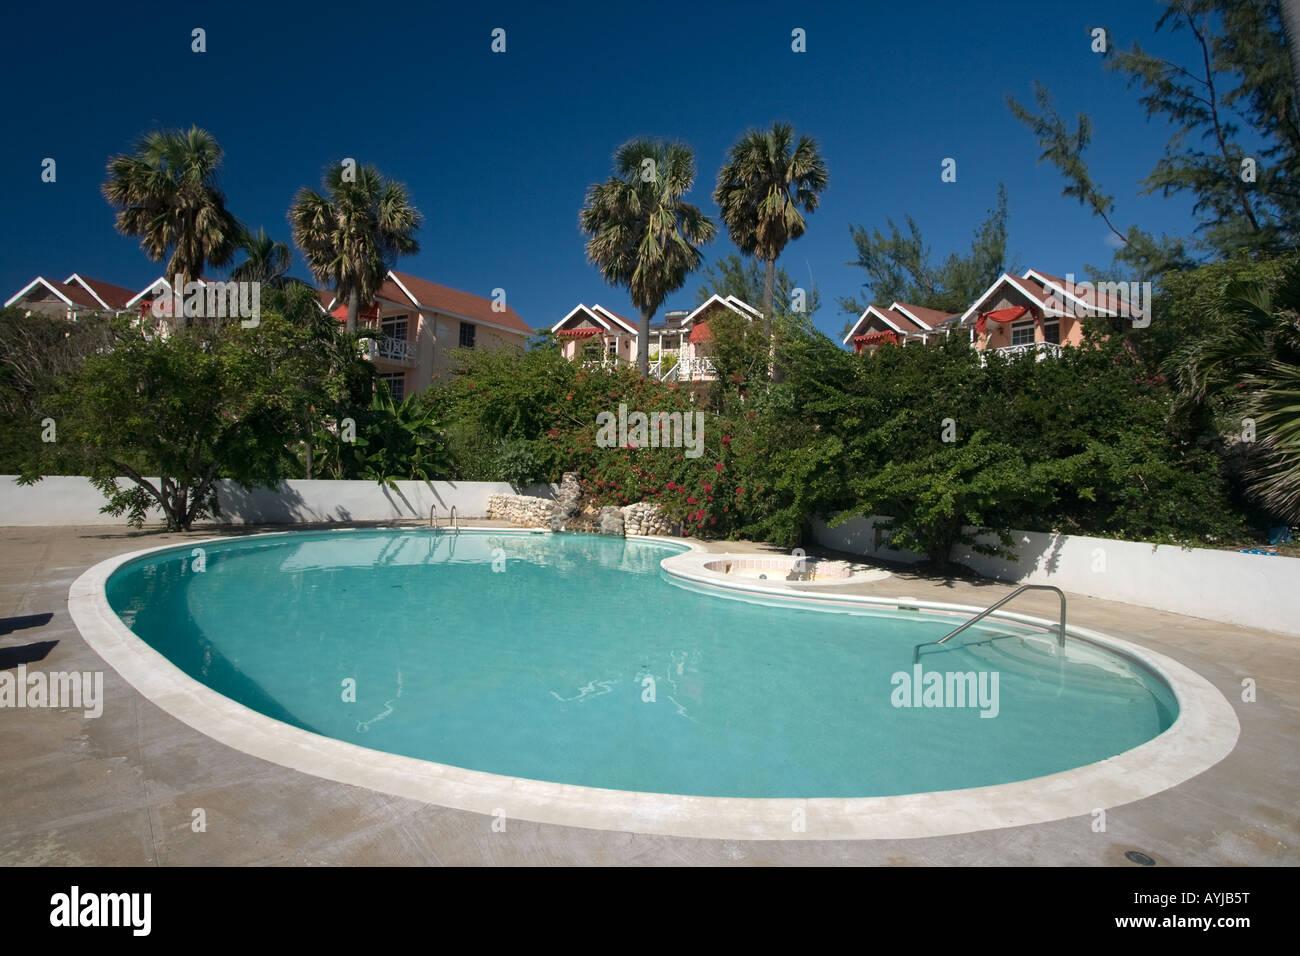 Jamaica Treasure beach Resort with Pool Stock Photo